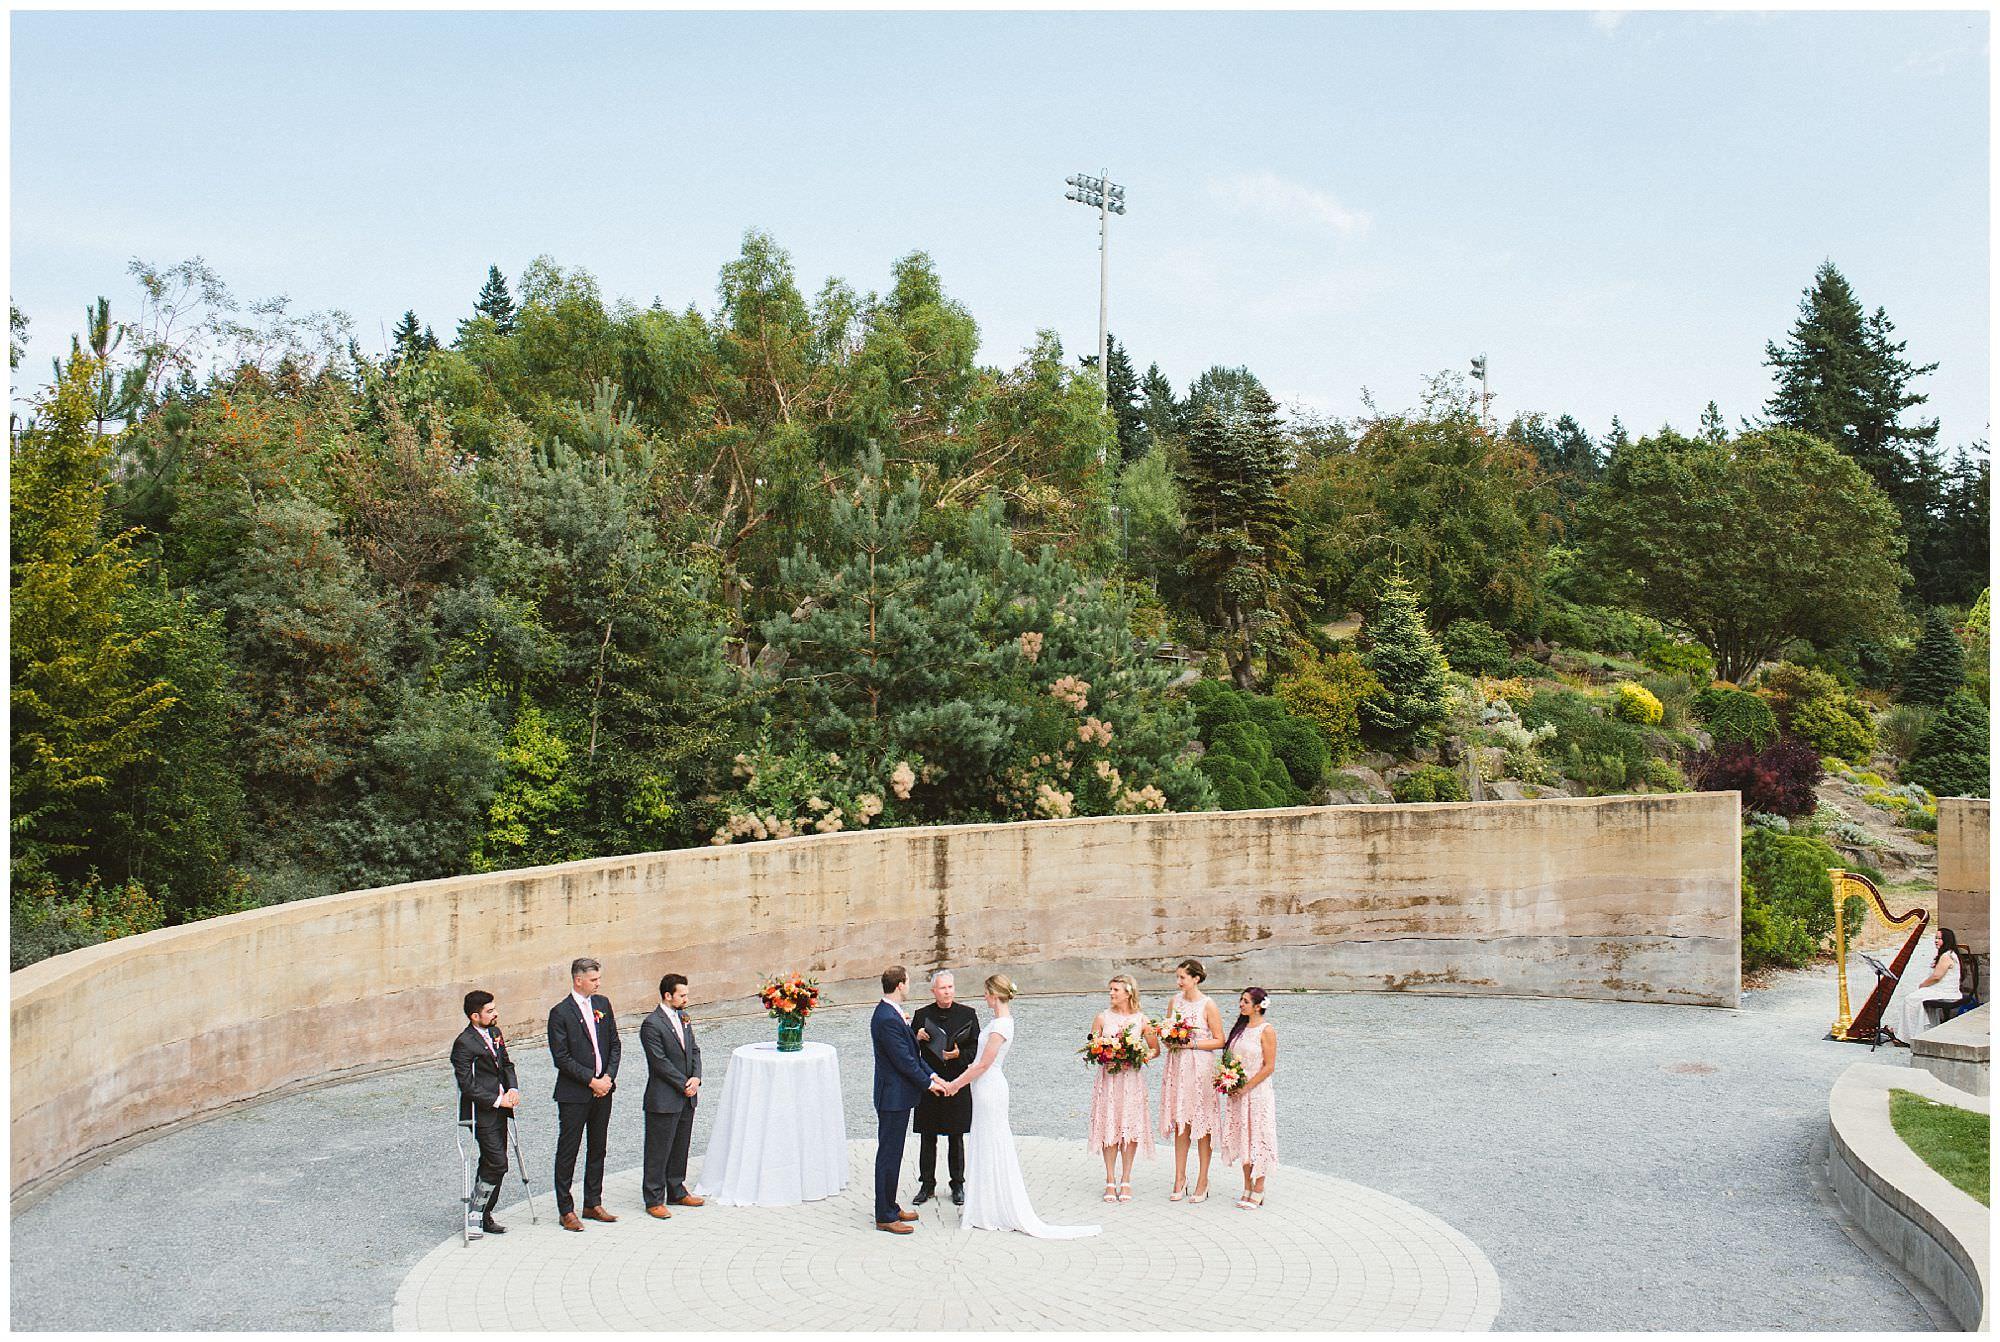 traditional outdoor wedding ceremony at UBC Botanical Gardens